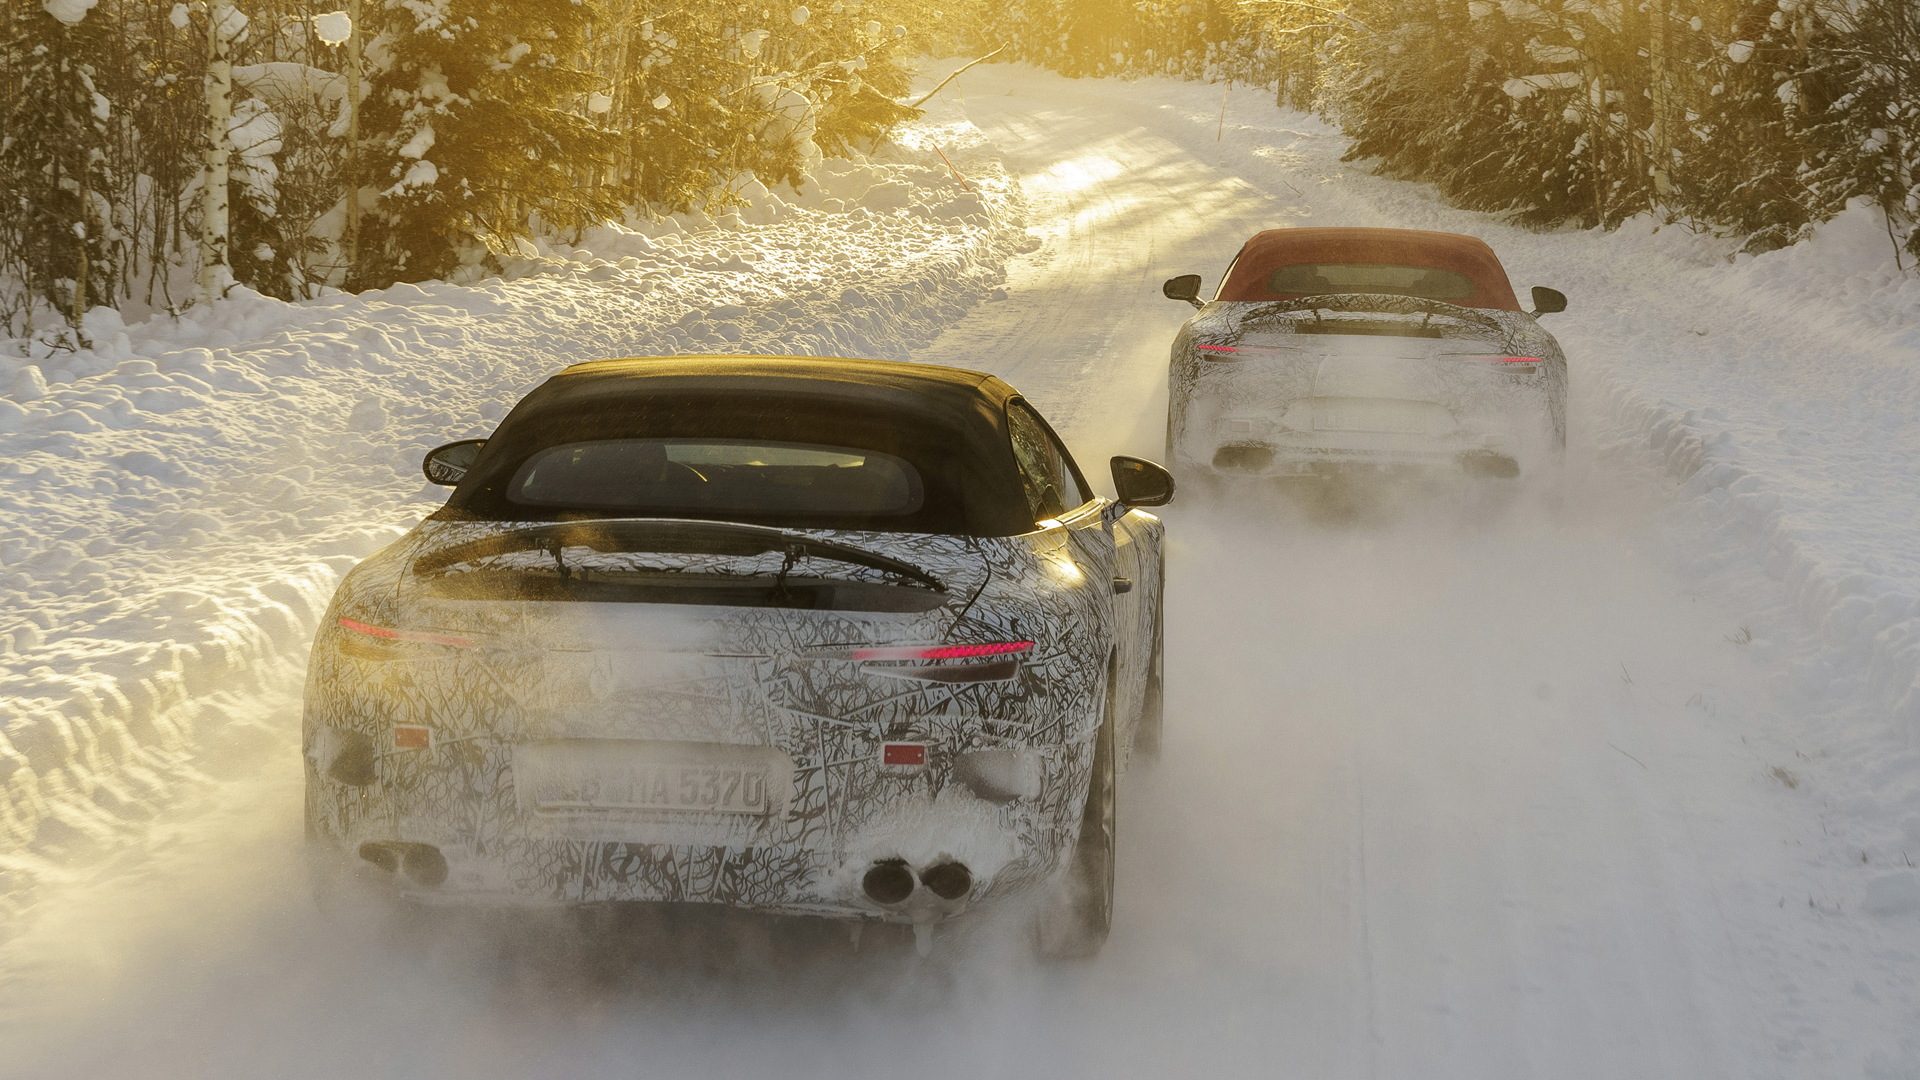 2022 Mercedes-Benz AMG SL Roadster prototype